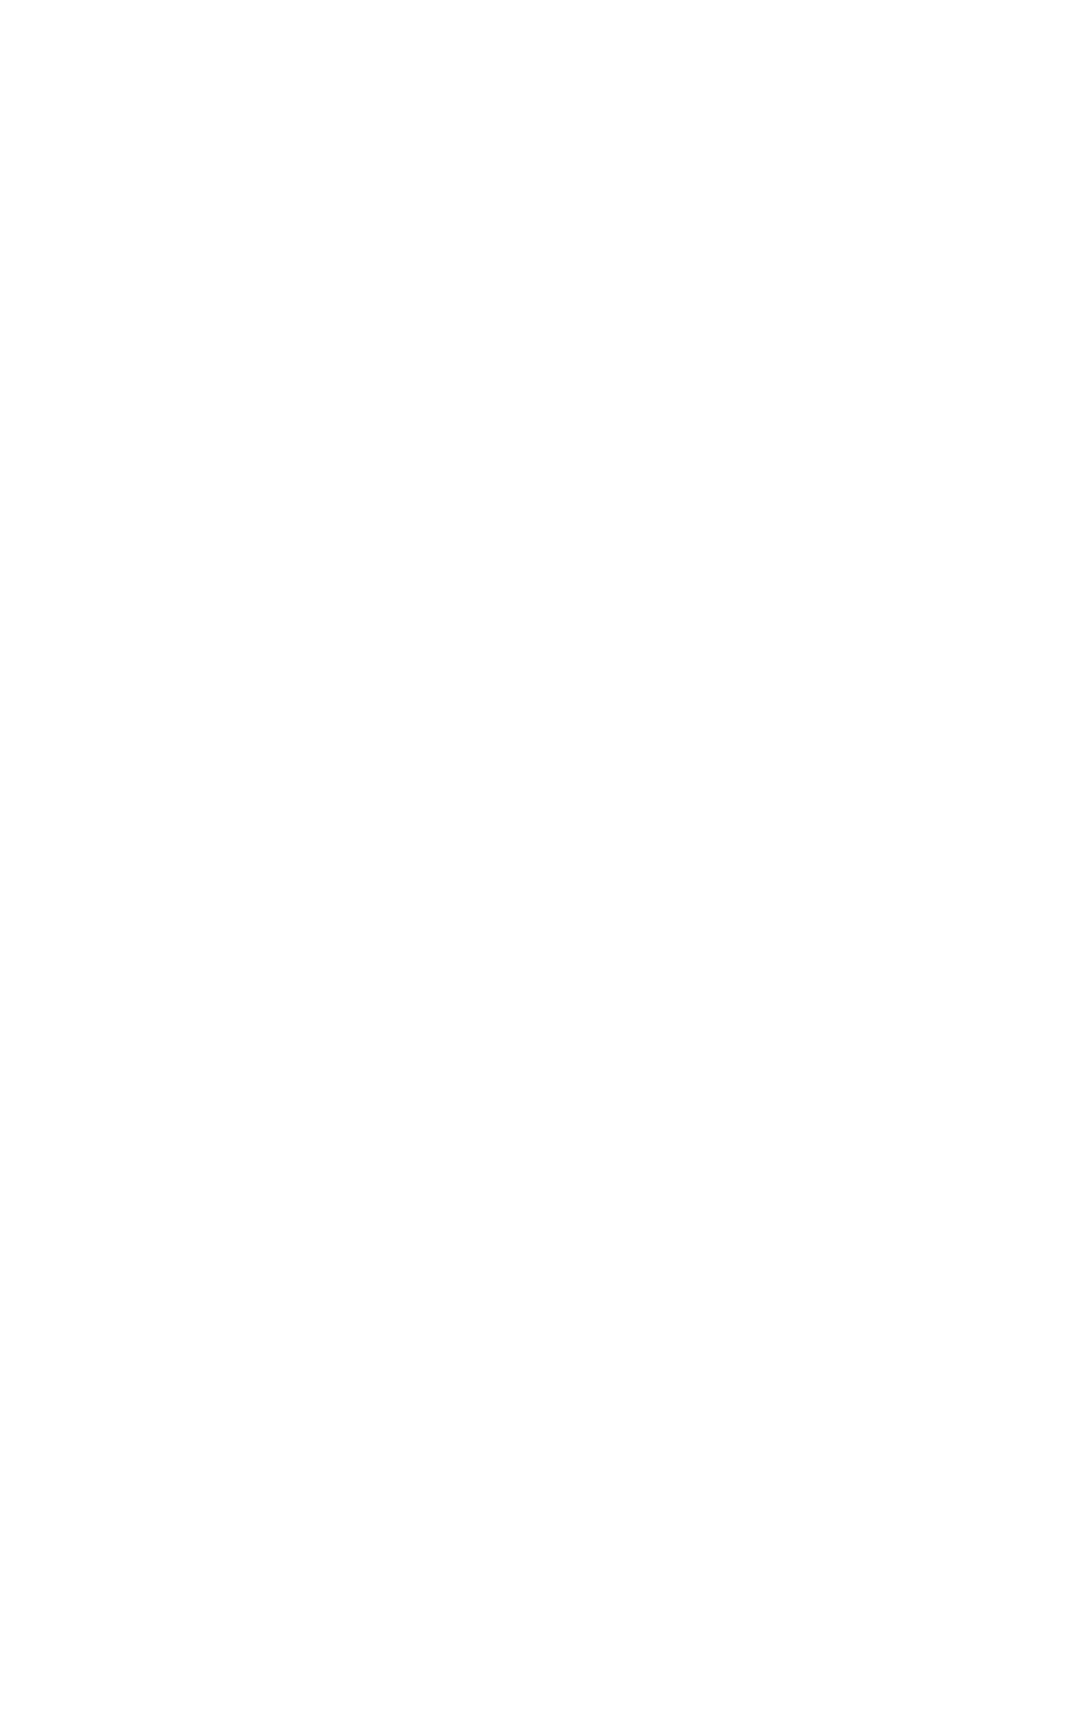 Perks pattern icon